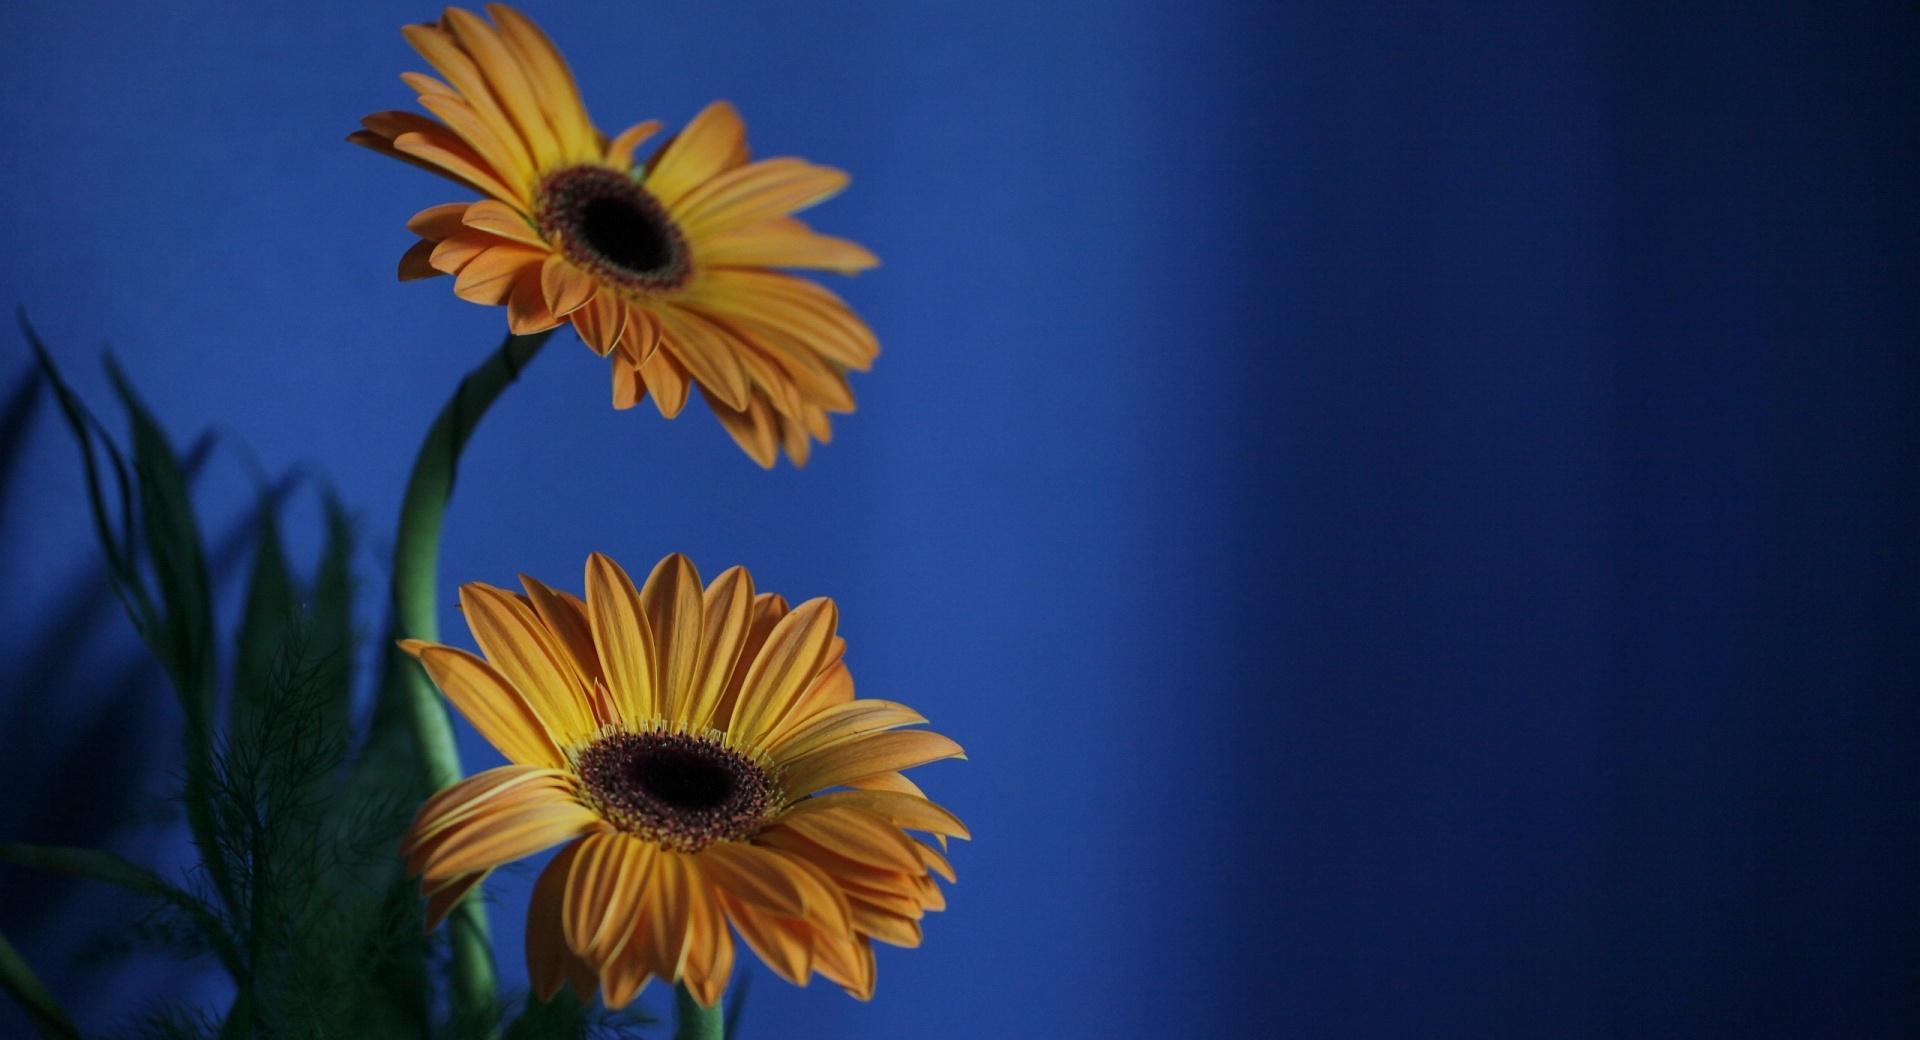 Orange Gerbera Flowers, Blue Background wallpapers HD quality